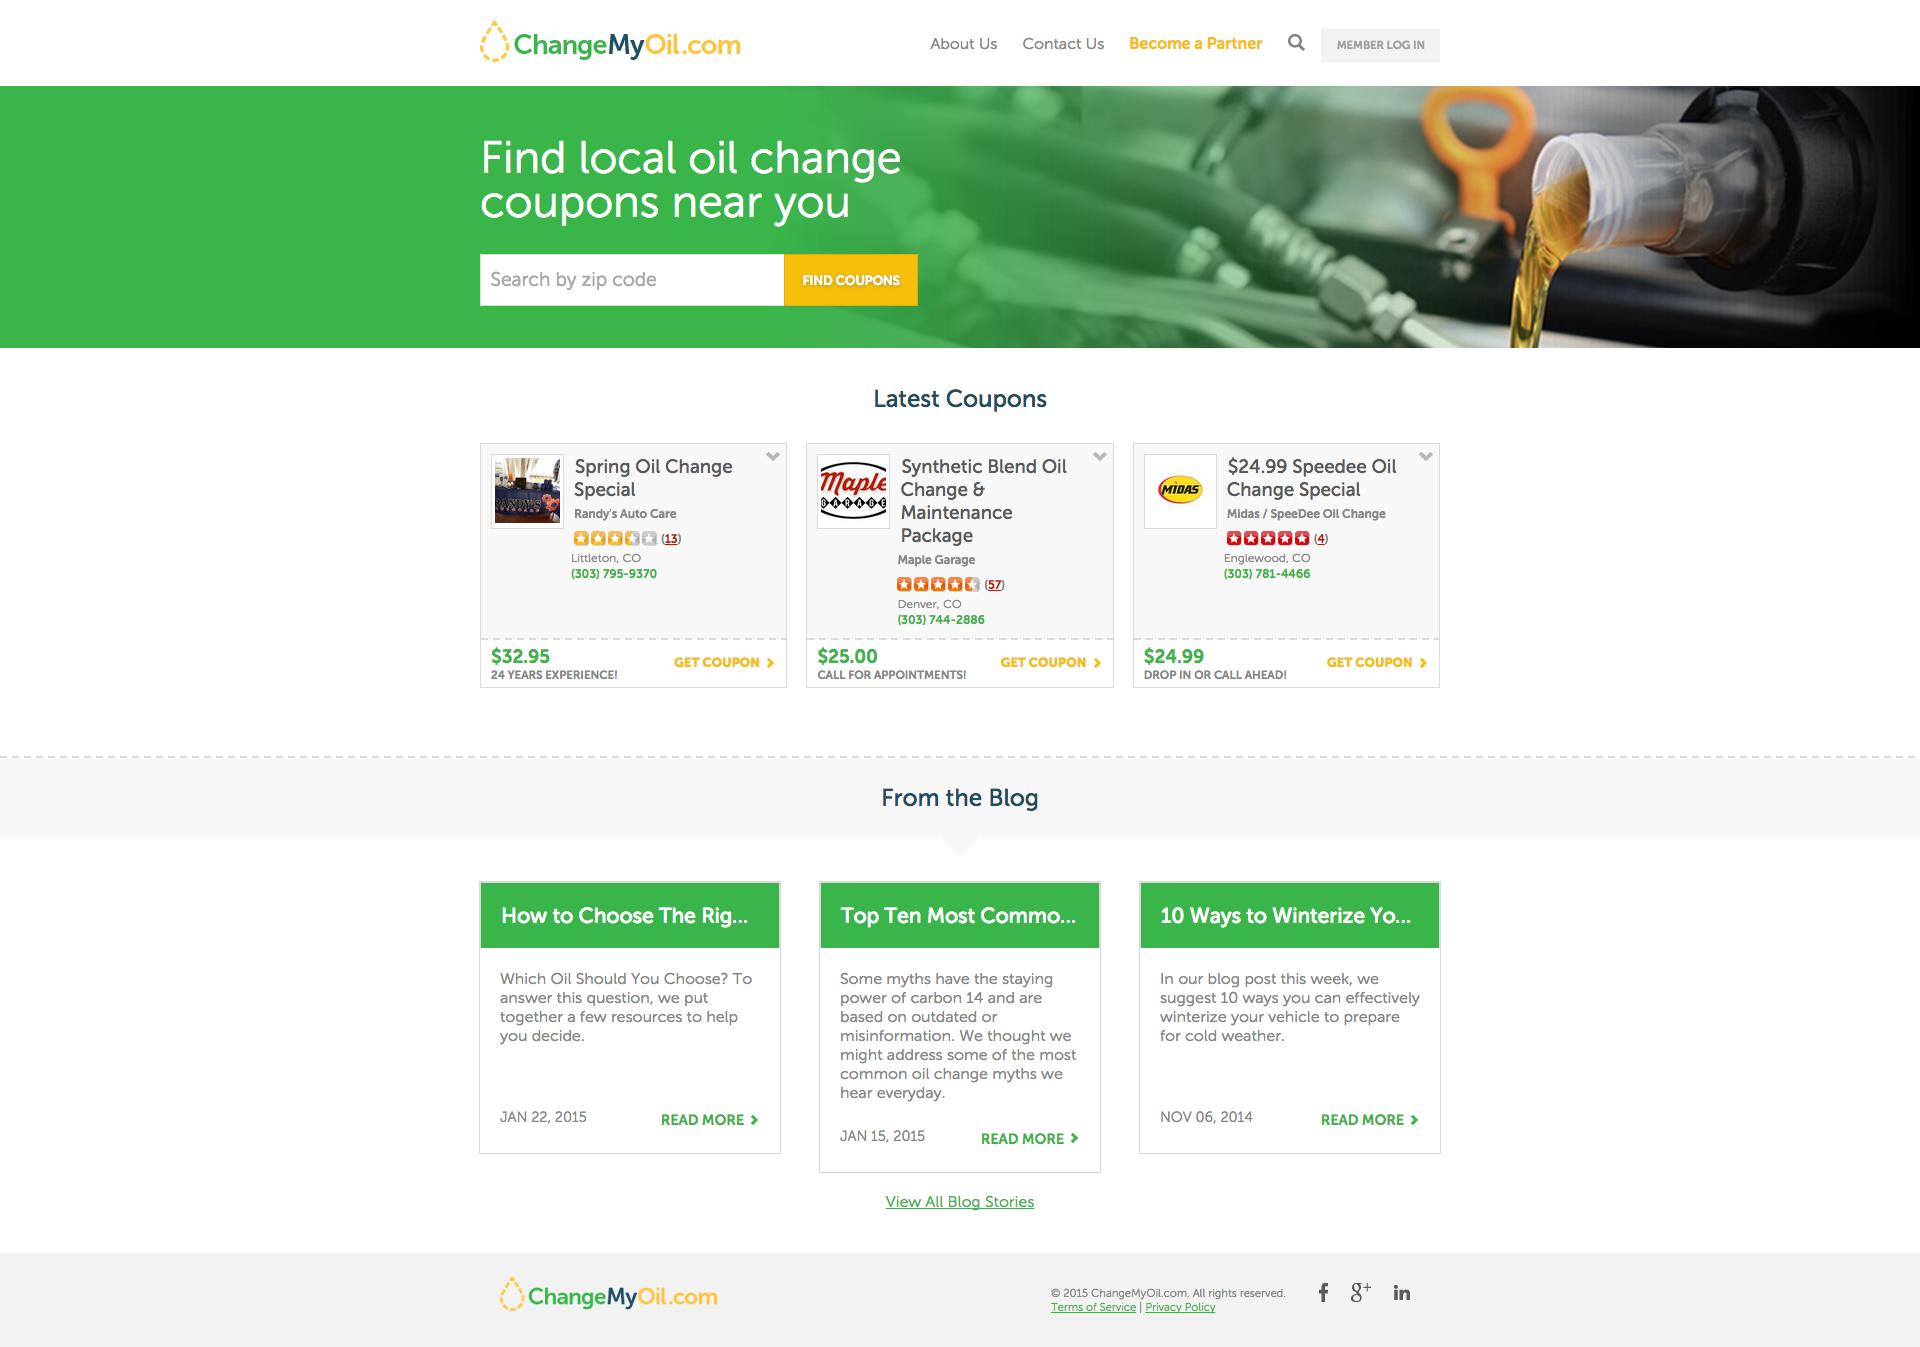 ChangeMyOil.com